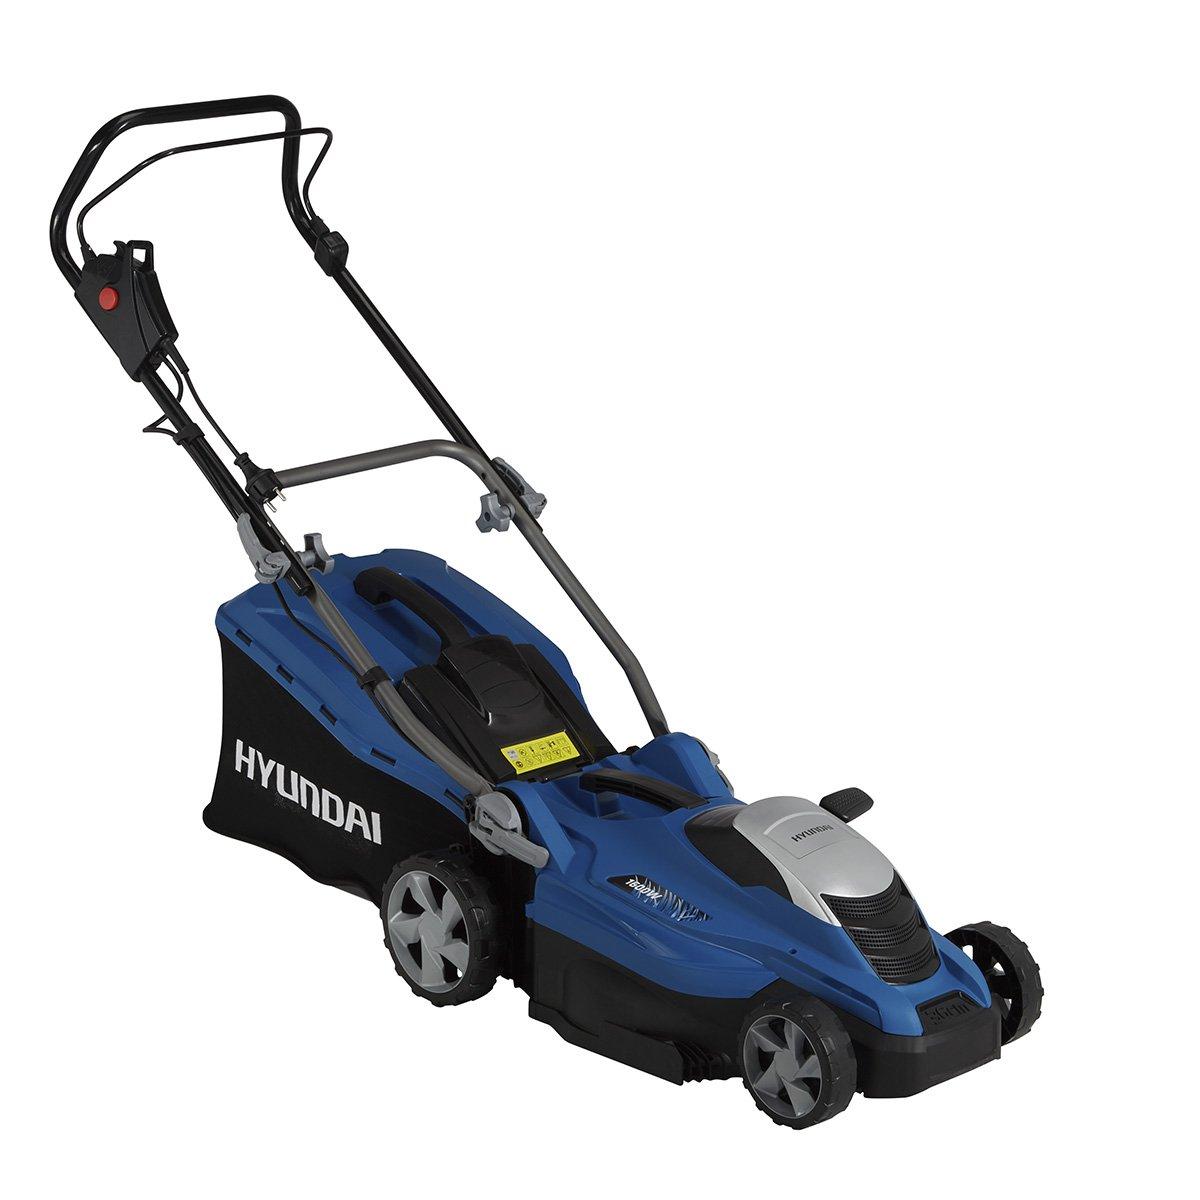 HYUNDAI Elektro-Rasenm/äher LM3601E 1600W, Schnittbreite 36 cm, 45L Fangkorb, 5-fache H/öhenverstellung 20-70 mm, Elektro-M/äher